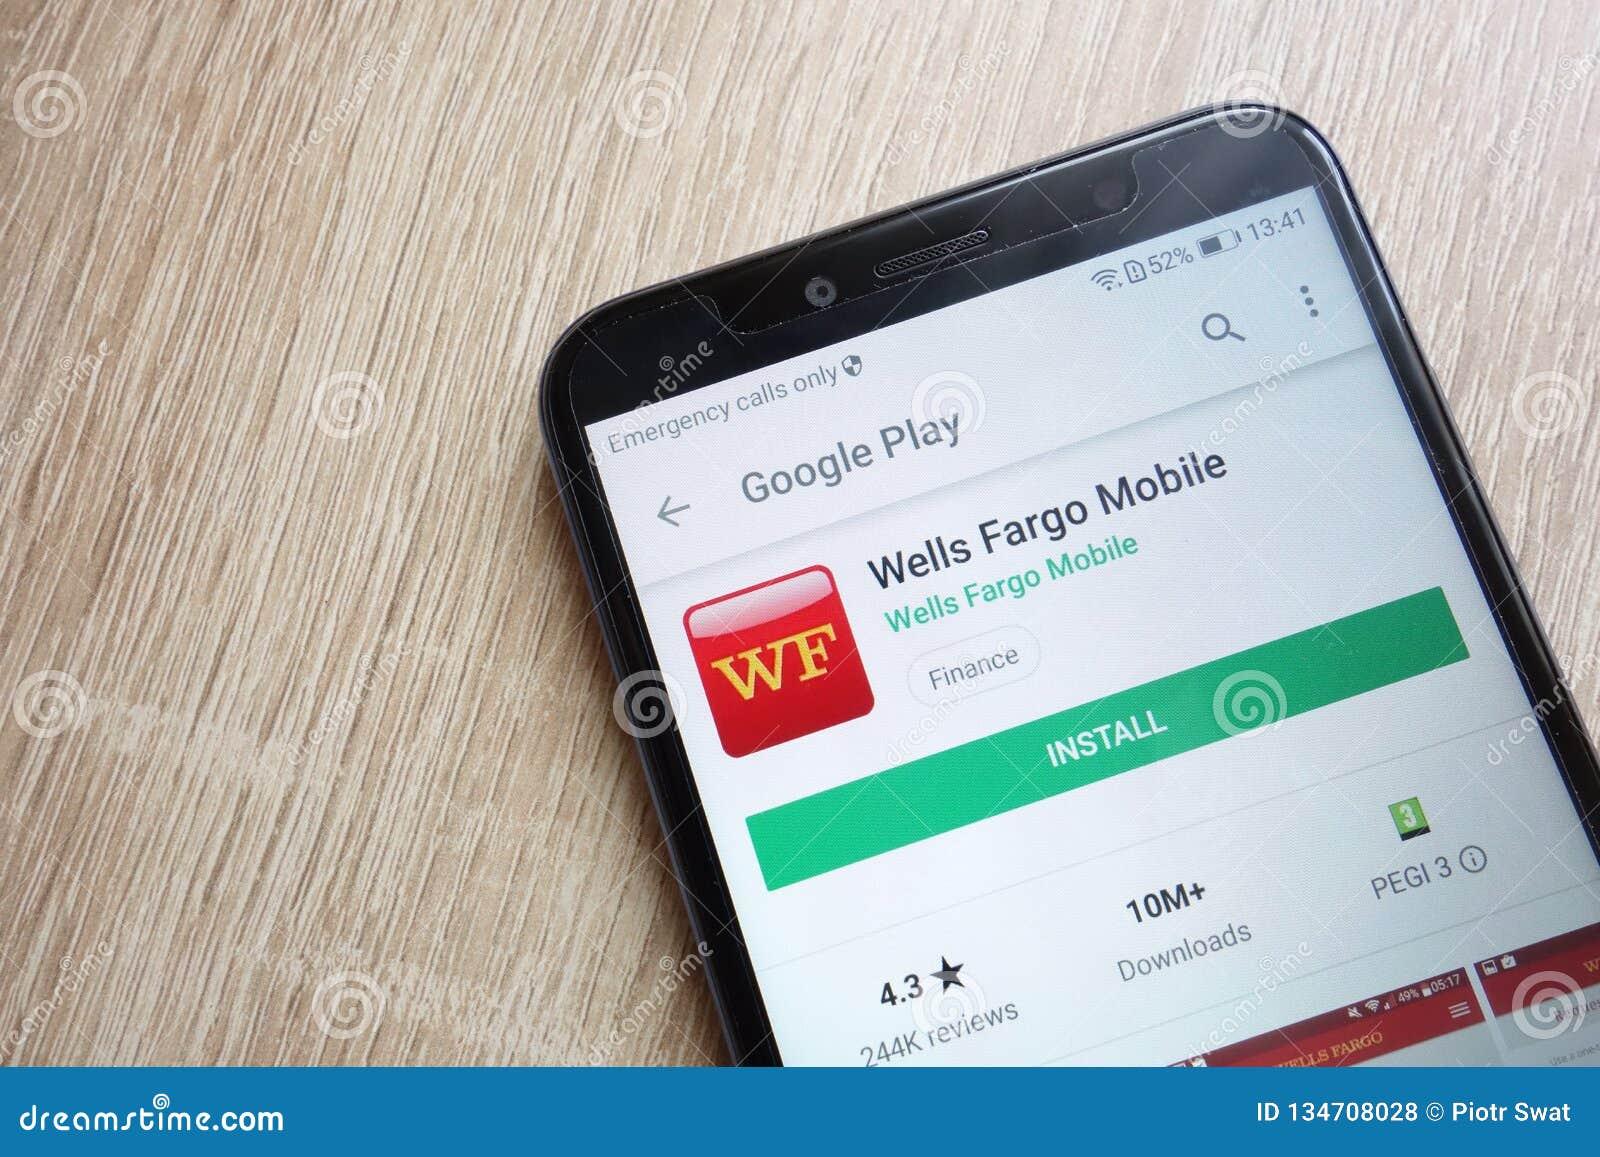 Wells Fargo Mobile App On Google Play Store Website